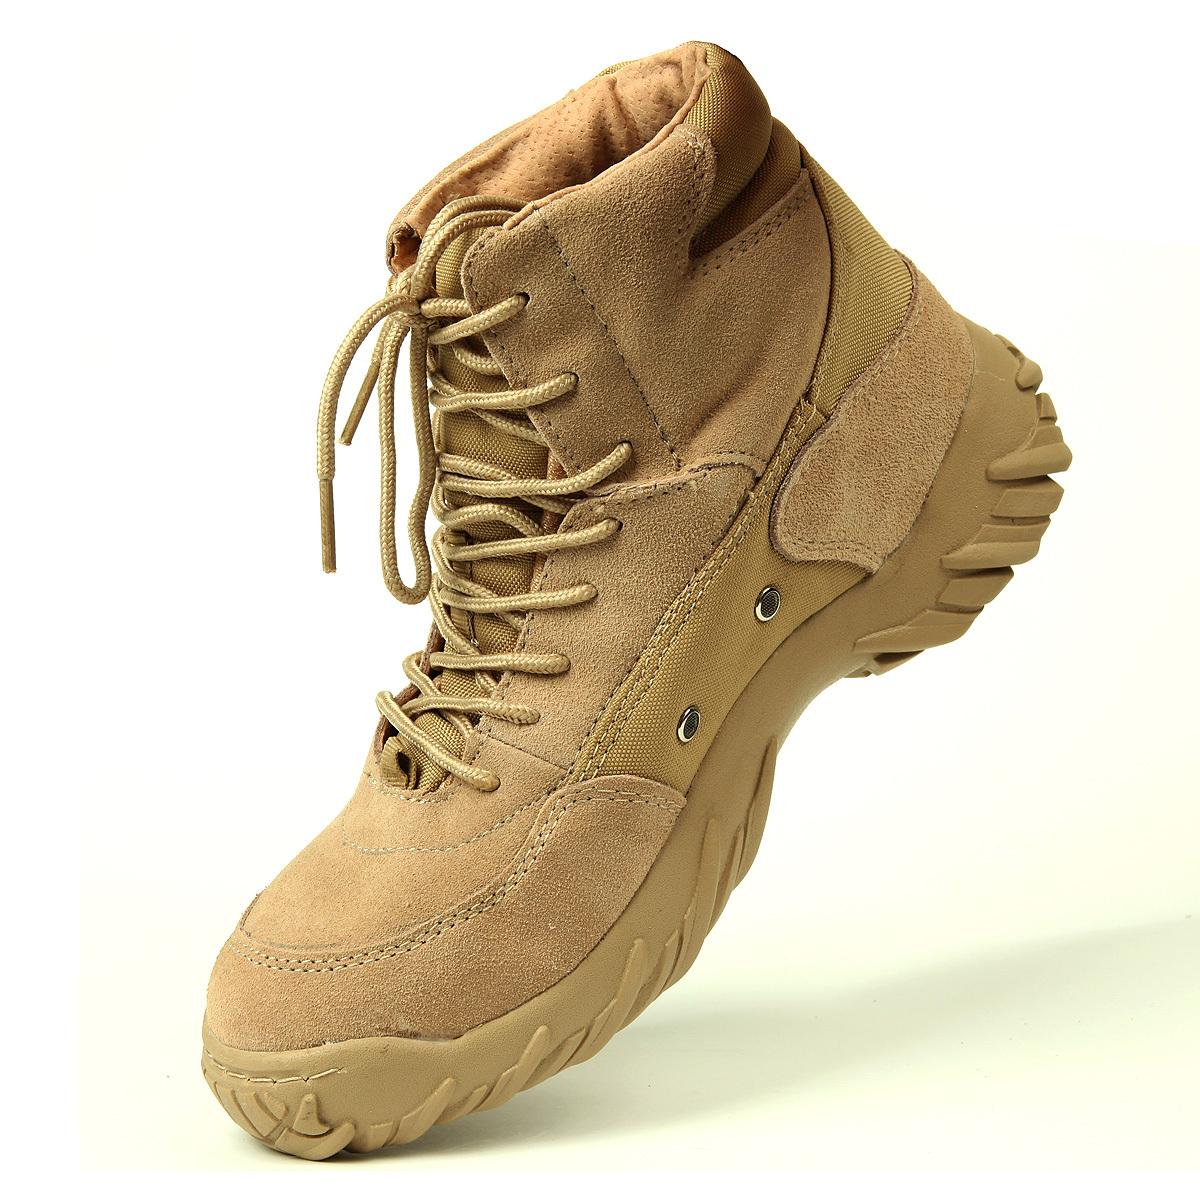 oakley assault boots review  oakley s.i